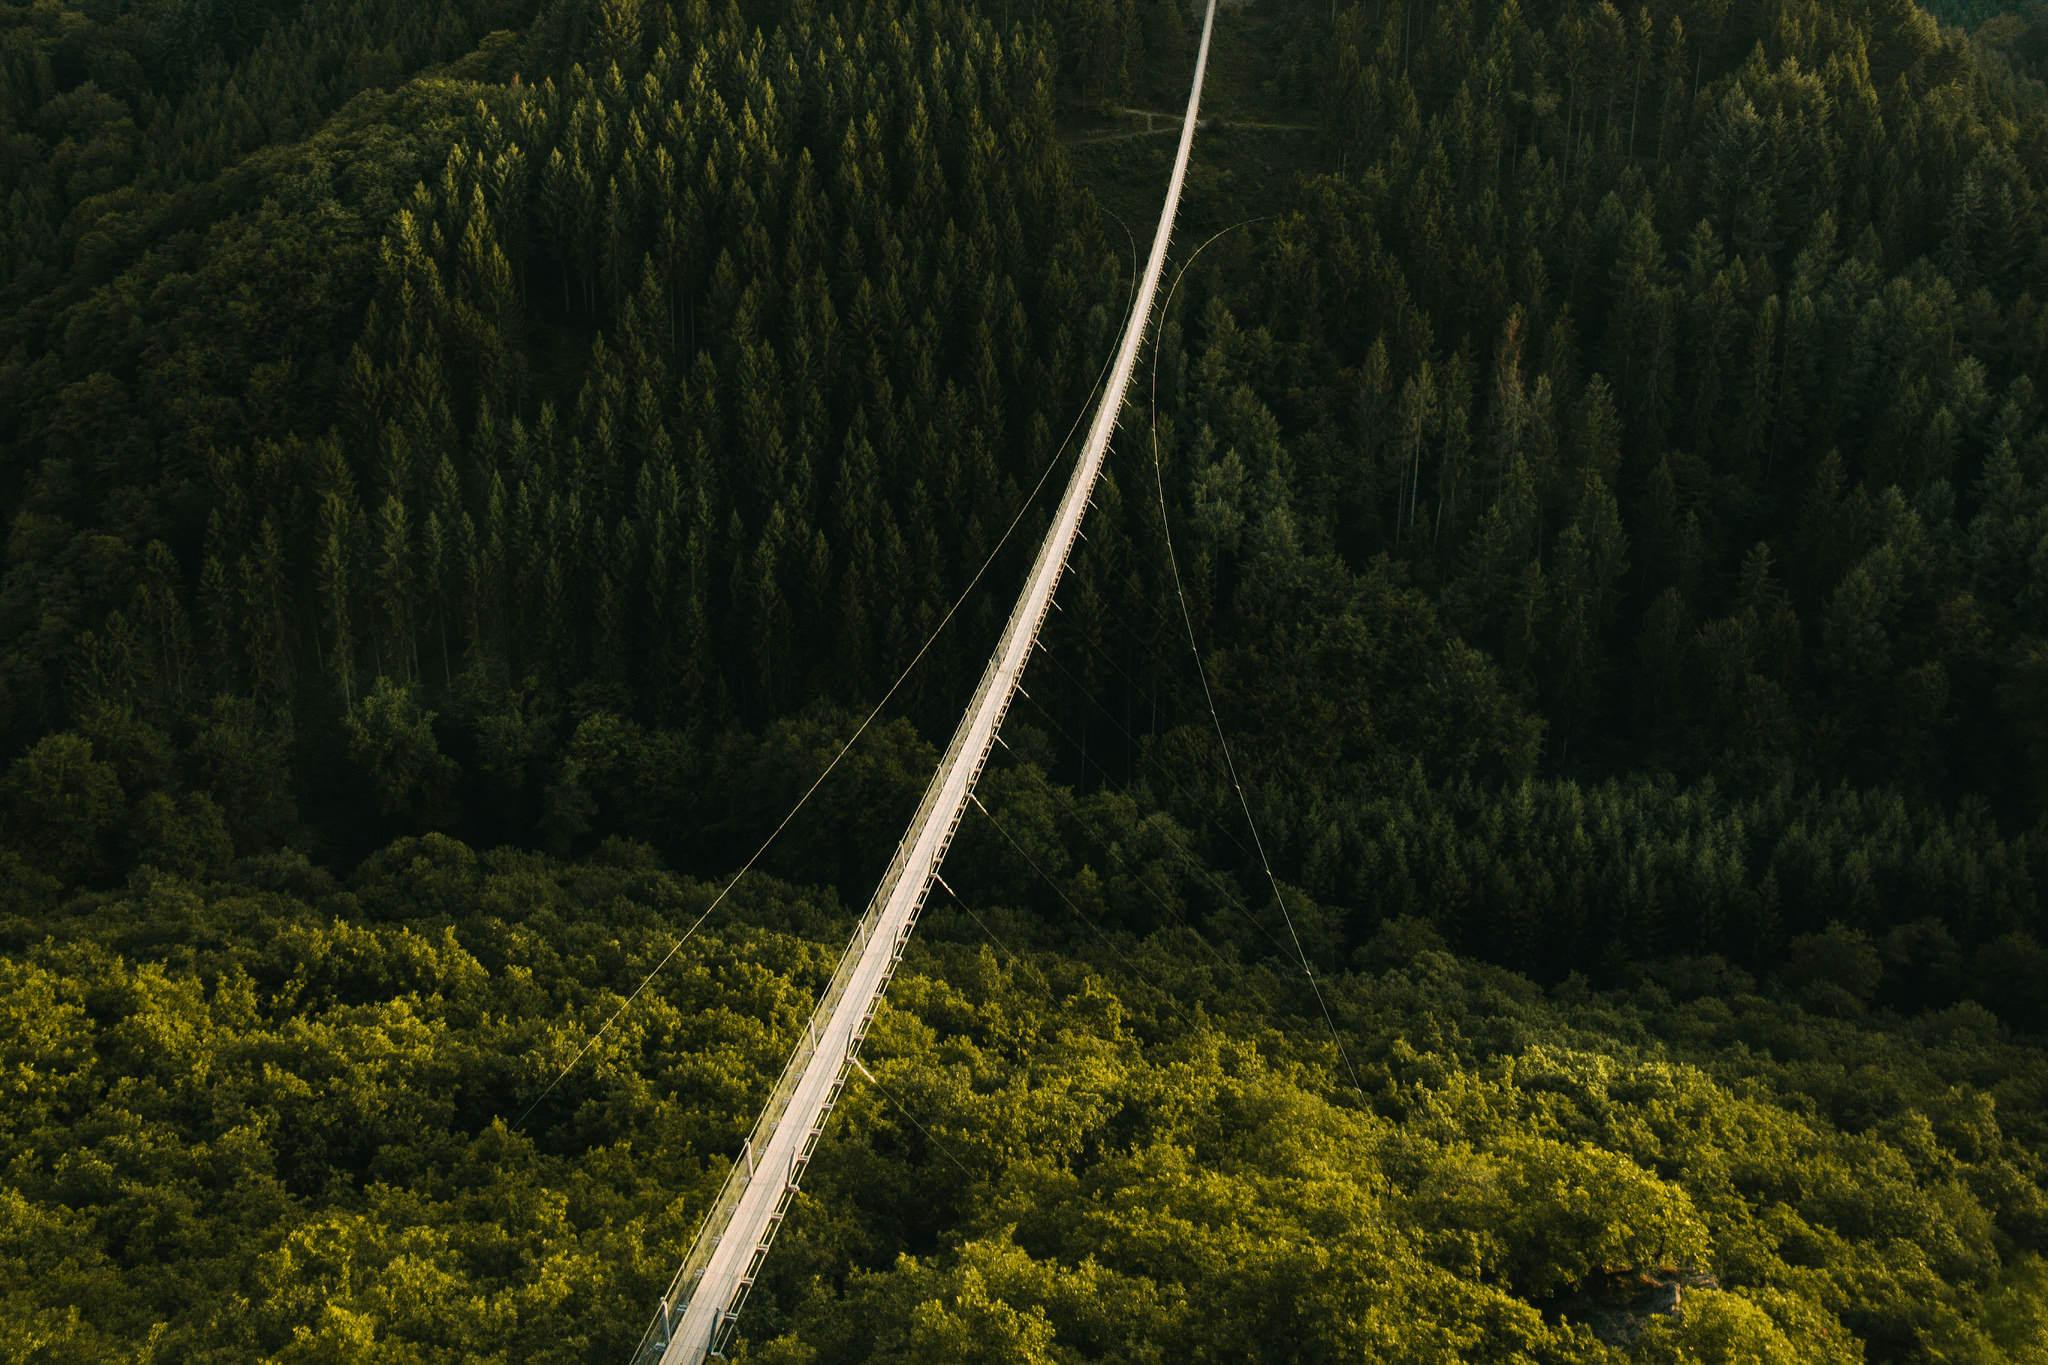 Landschaftsfotografie fotograf filmemacher frankfurt patrick schmetzer drohne landschaft natur 3